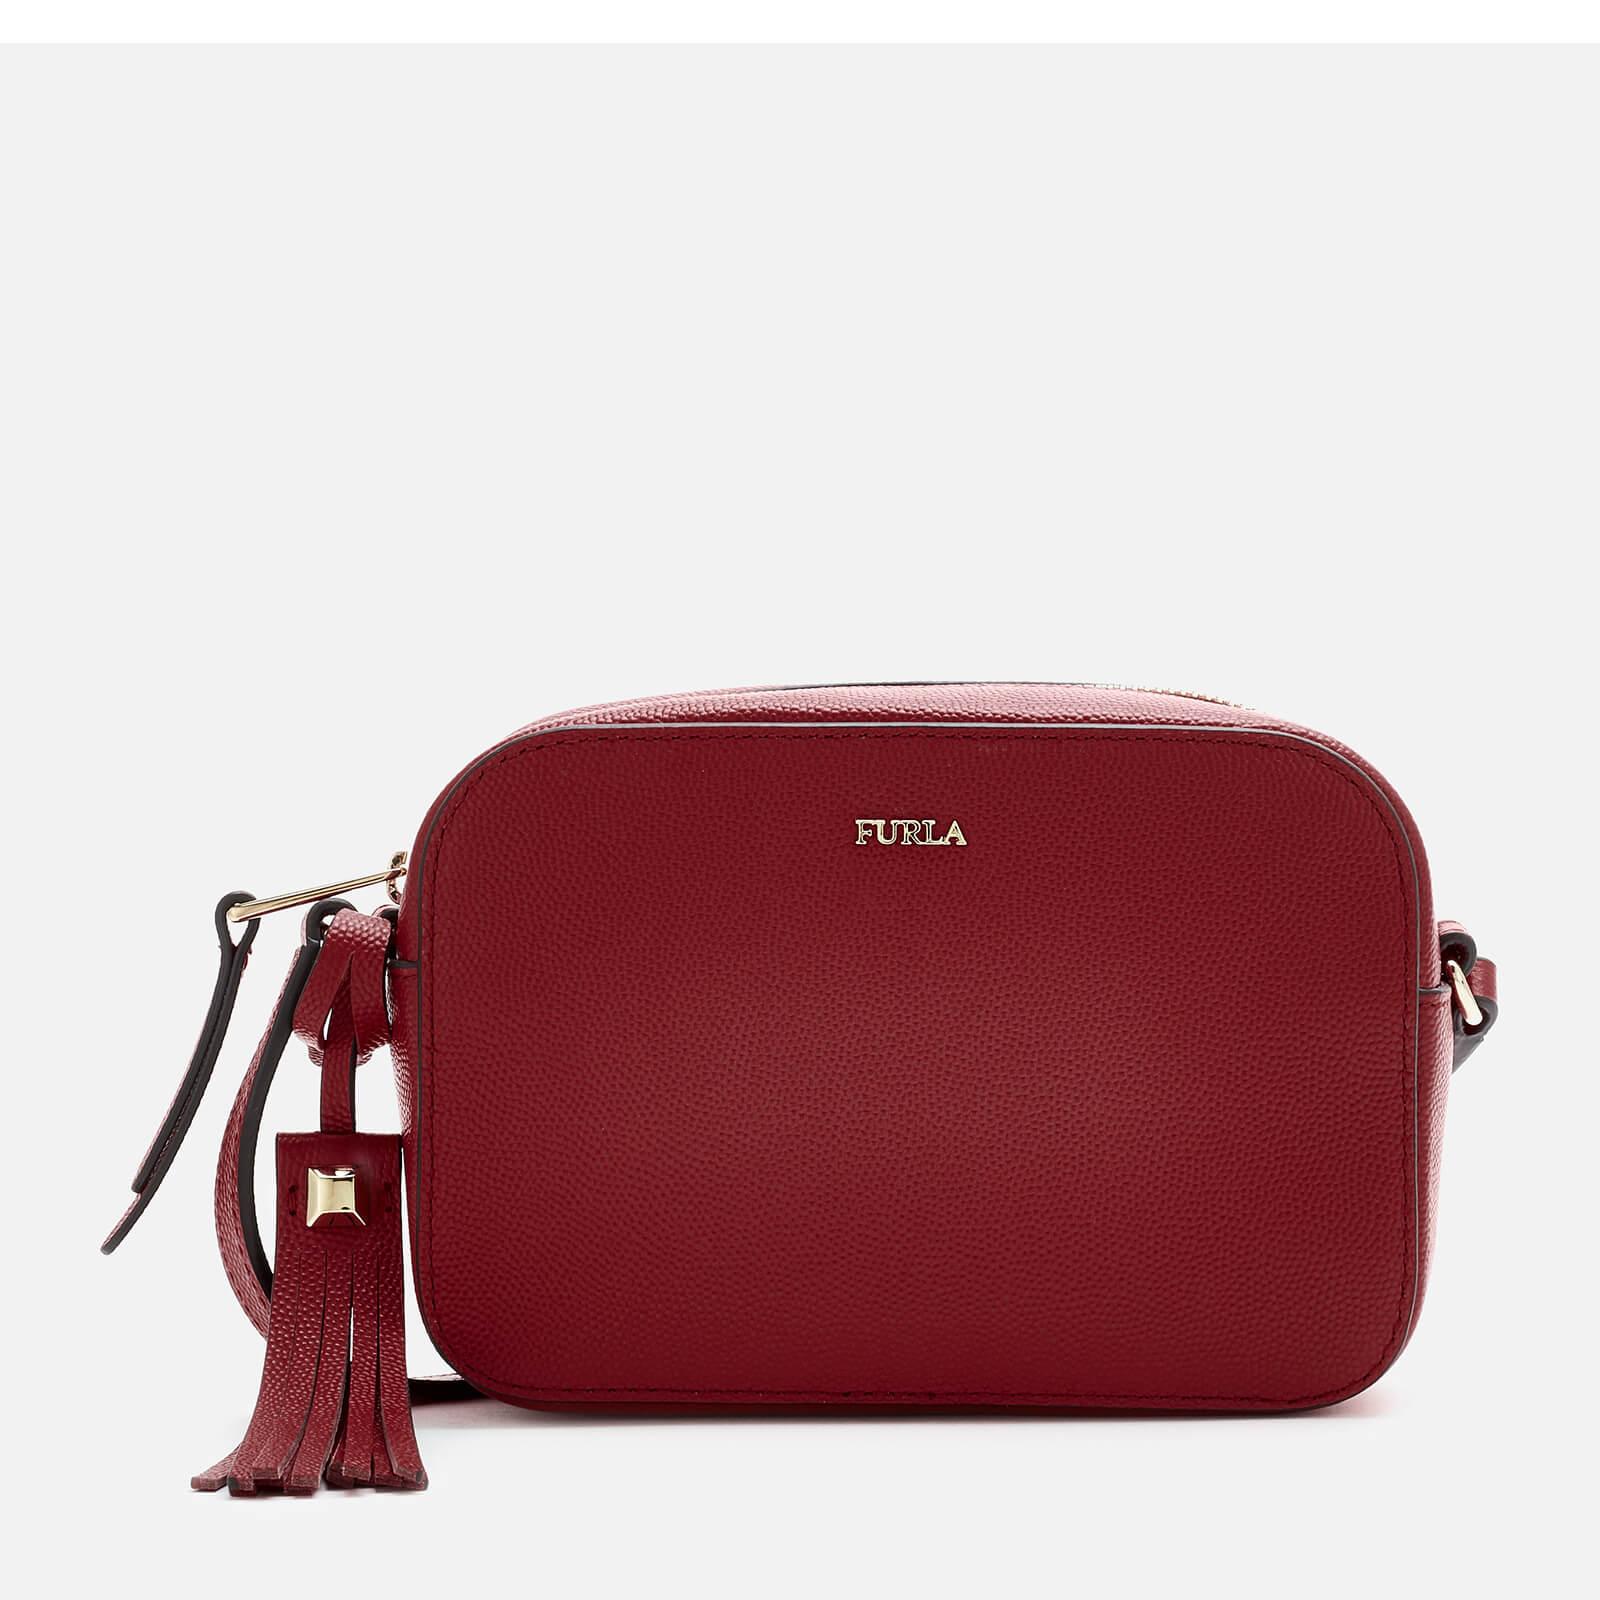 Furla Women's Mimi Mini Cross Body Bag - Red